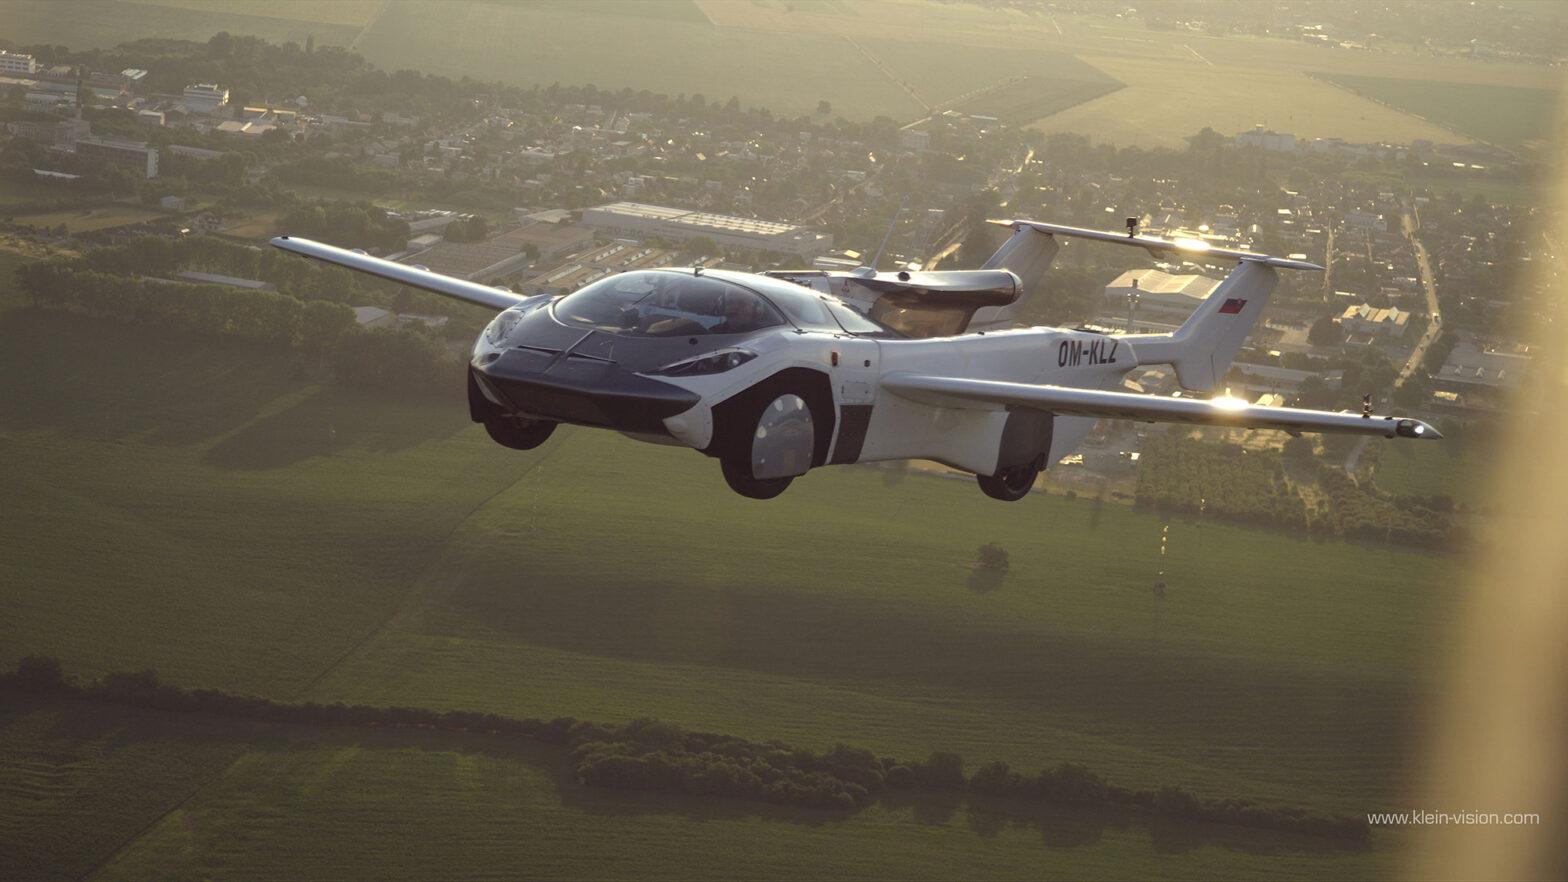 Klein Vision Flying Car Makes First Inter-city Flight